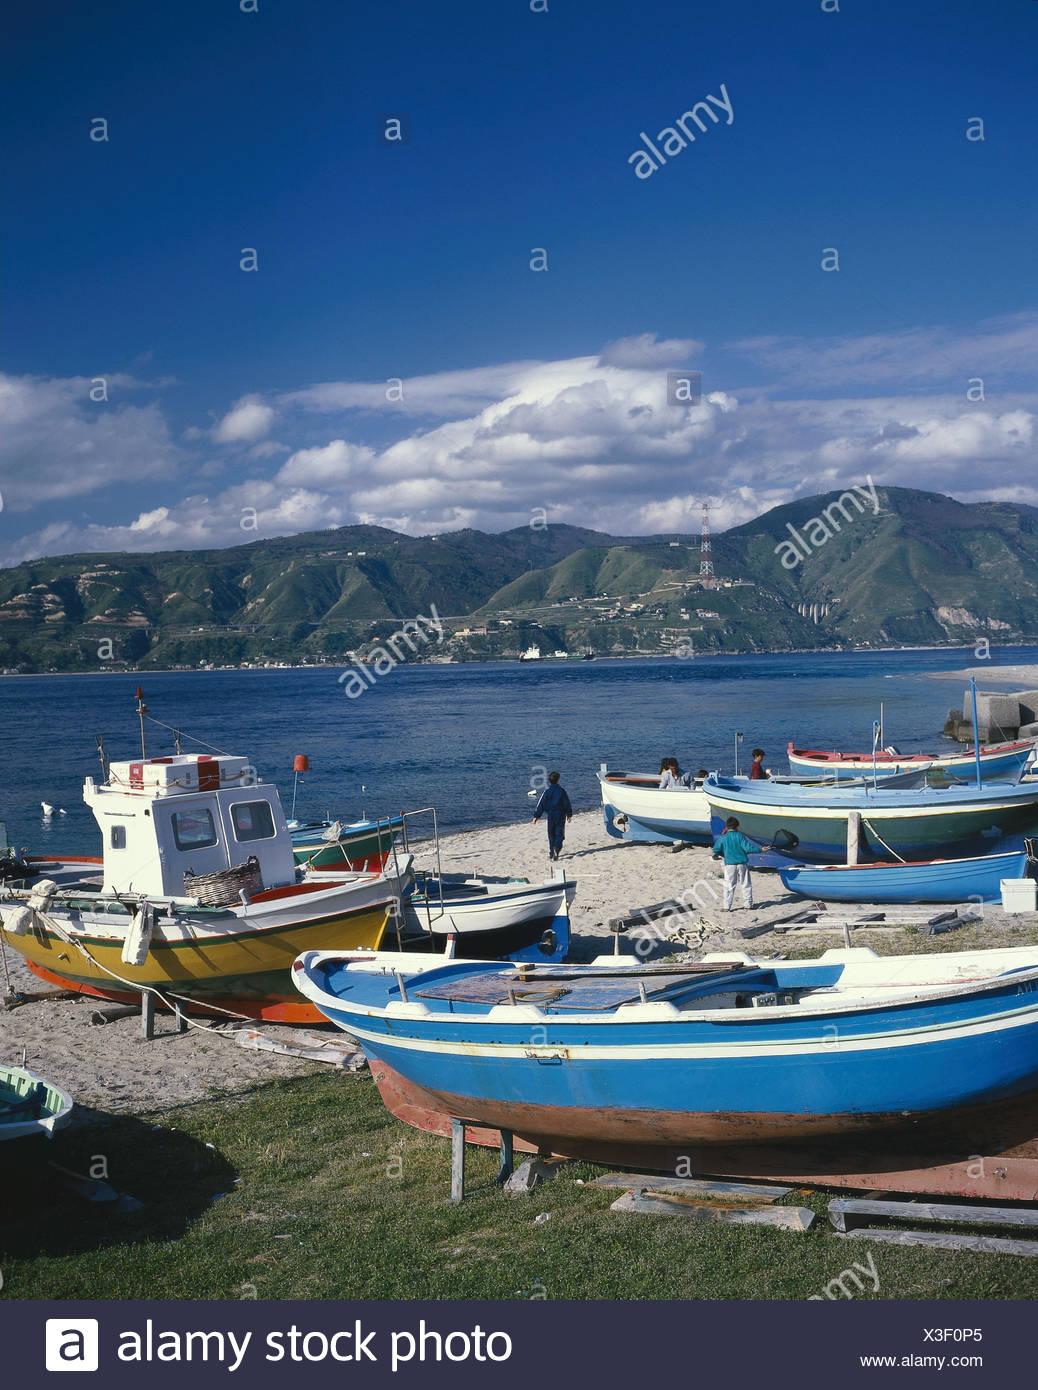 I' Sicily, Stretto Tu Messina (strait) with Mordello, fishing boats on the beach entries loudly originator - Stock Image